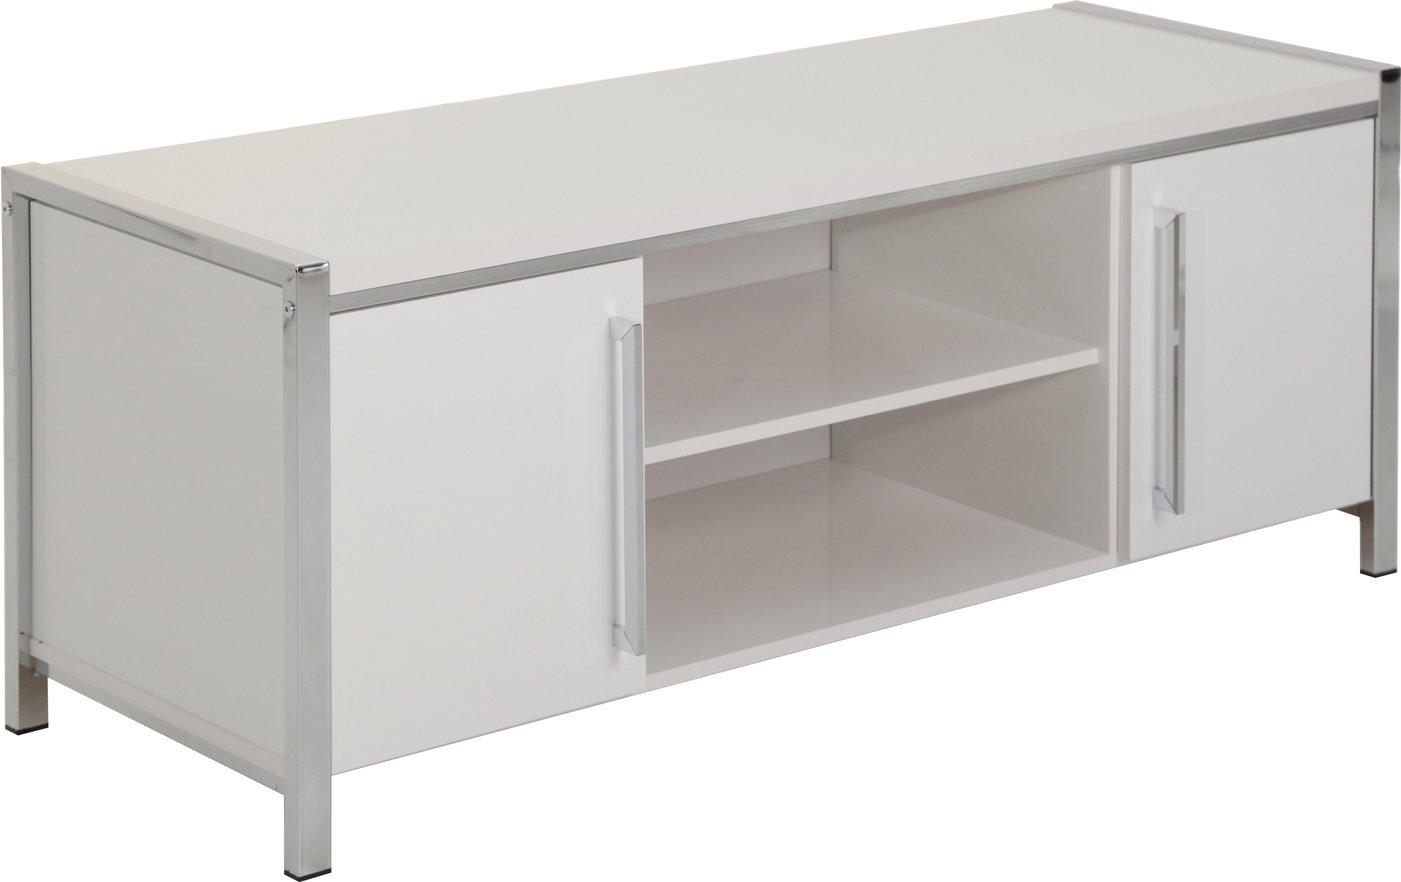 Valufurniture Charisma 2 Door 1 Shelf Flat Screen Tv Unit White Gloss Chrome